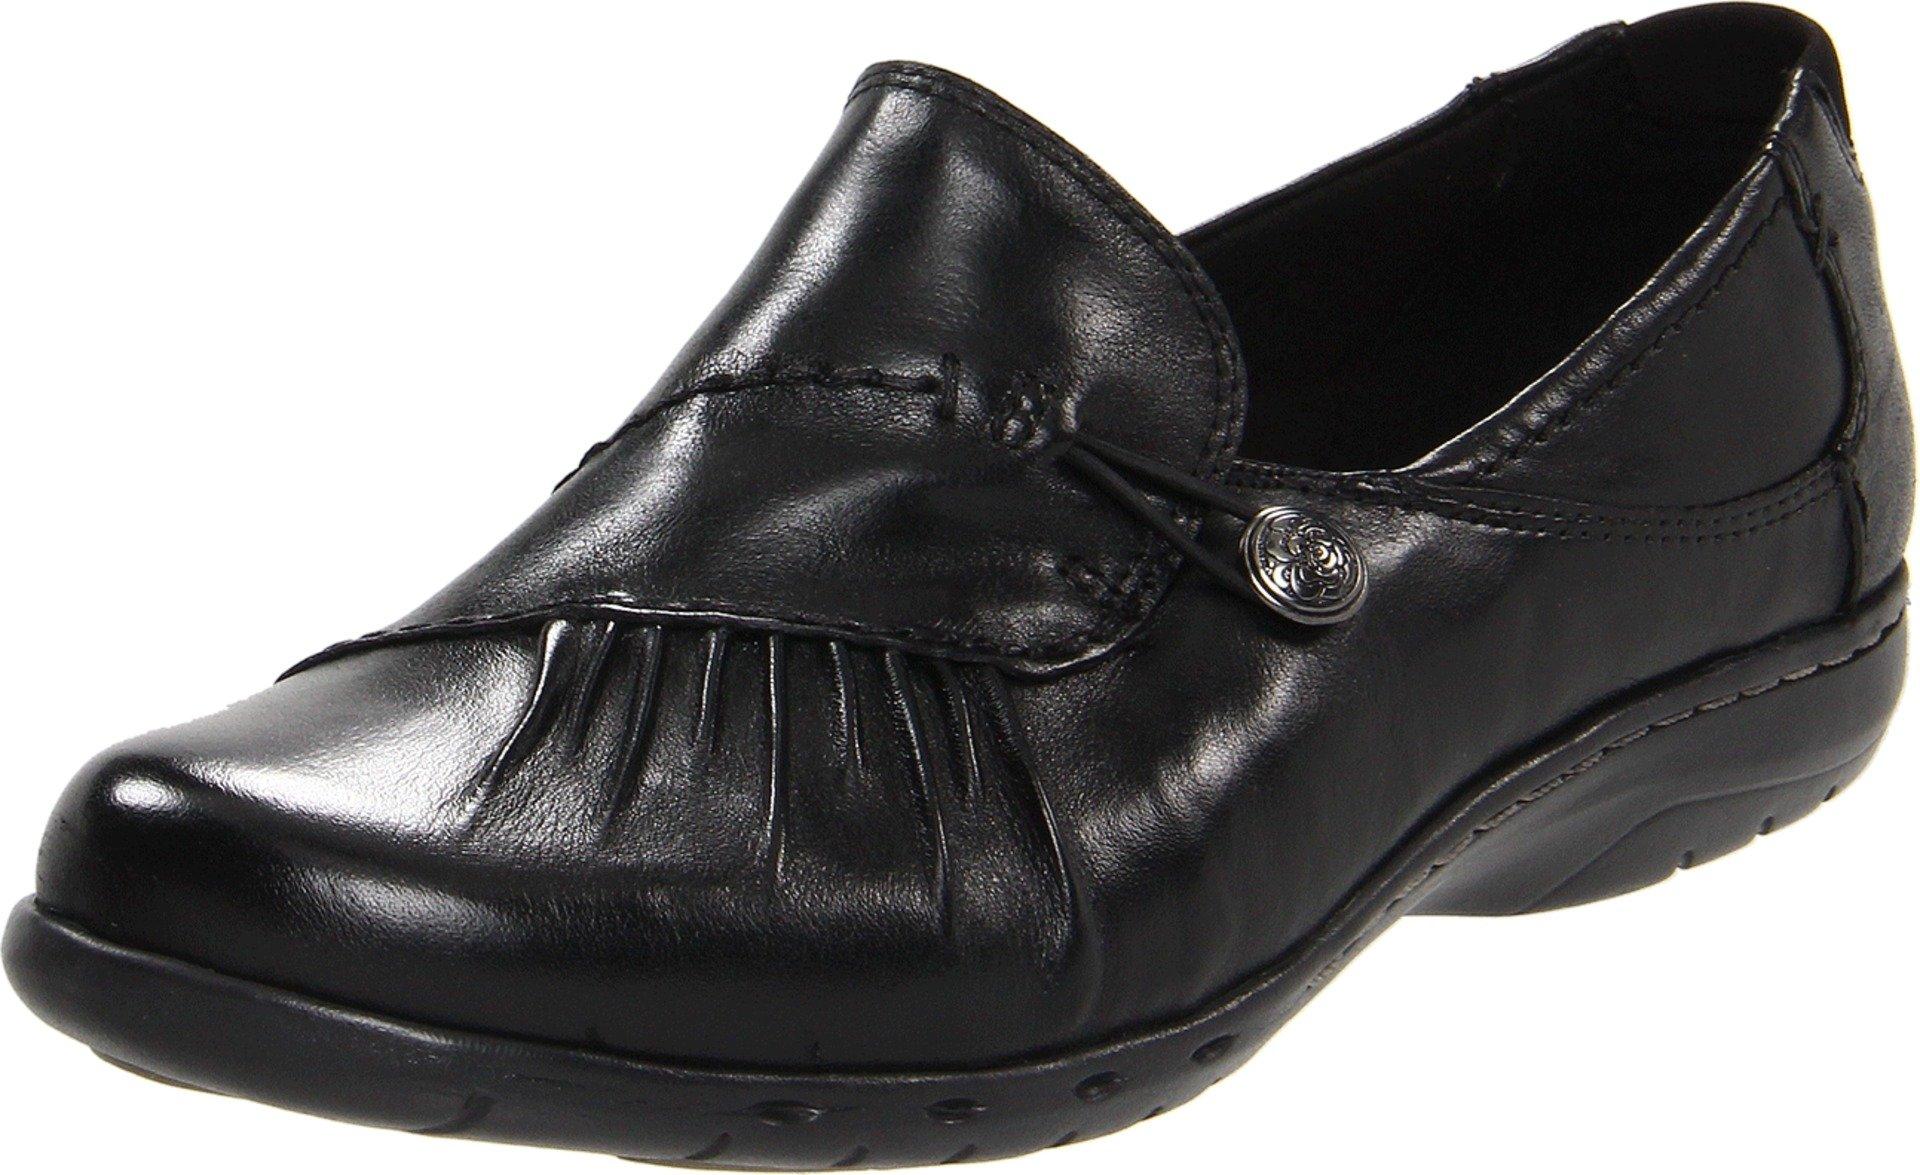 Cobb Hill Women's Paulette BLACK Leather Dress 12 B(M) US